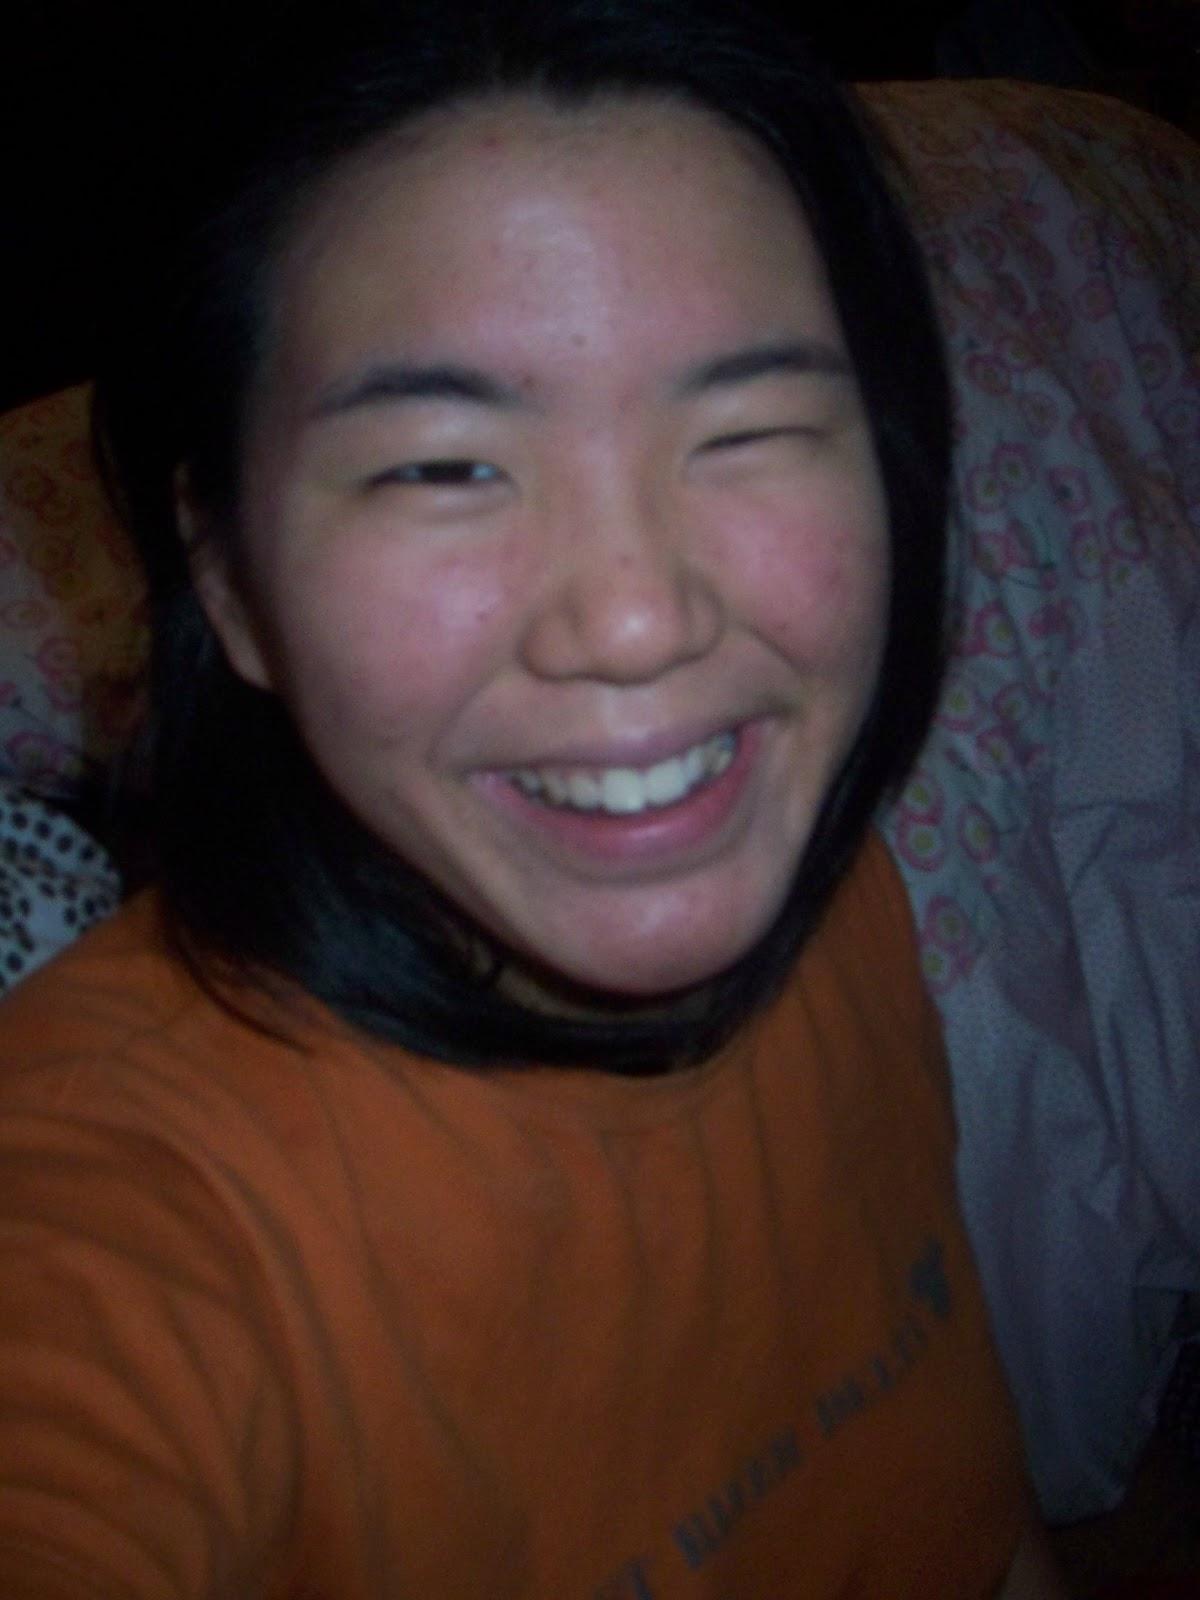 Ugly & Chubby Korean camwhore girl's really disgusting ...